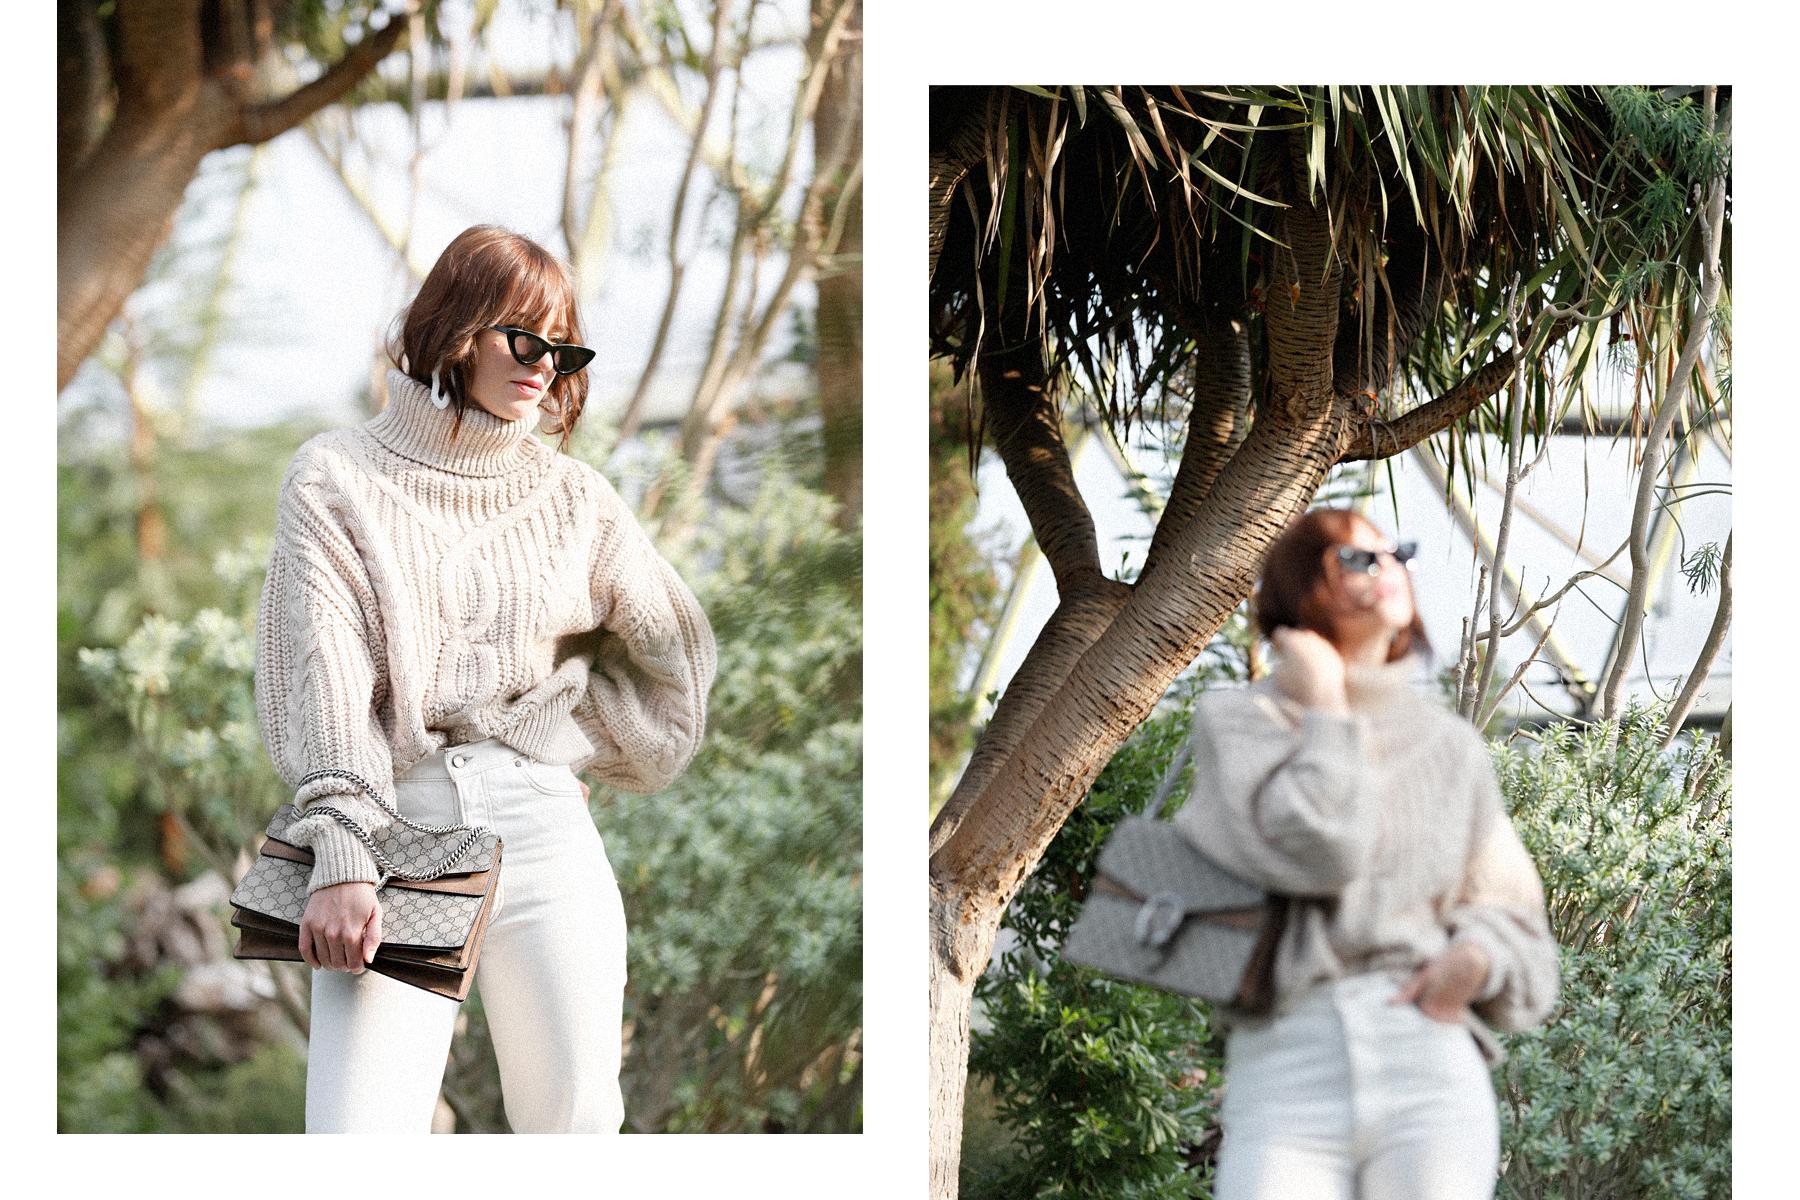 outfit big cable knit white cord pumps mango adam selman x le specs last lolita sunglasses ootd outfitblogger styleblogger modeblogger catsanddogsblog düsseldorf ricarda schernus max bechmann fotografie film 4